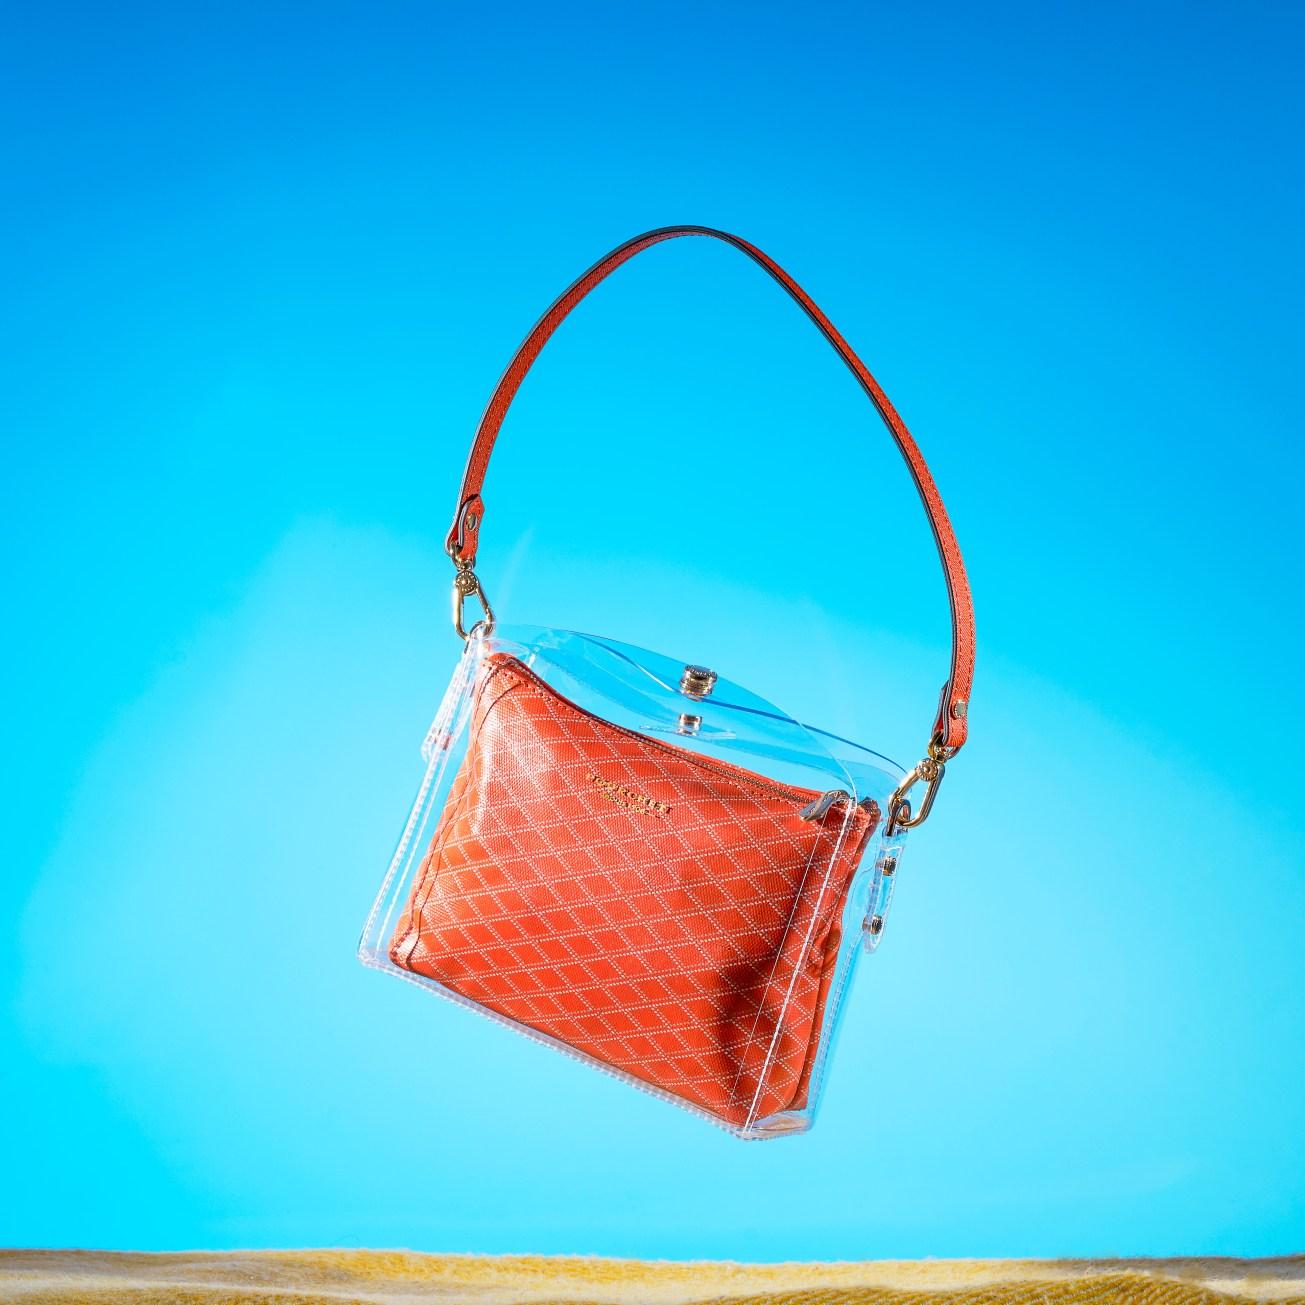 Example of product photography / produkfotograf - handbag